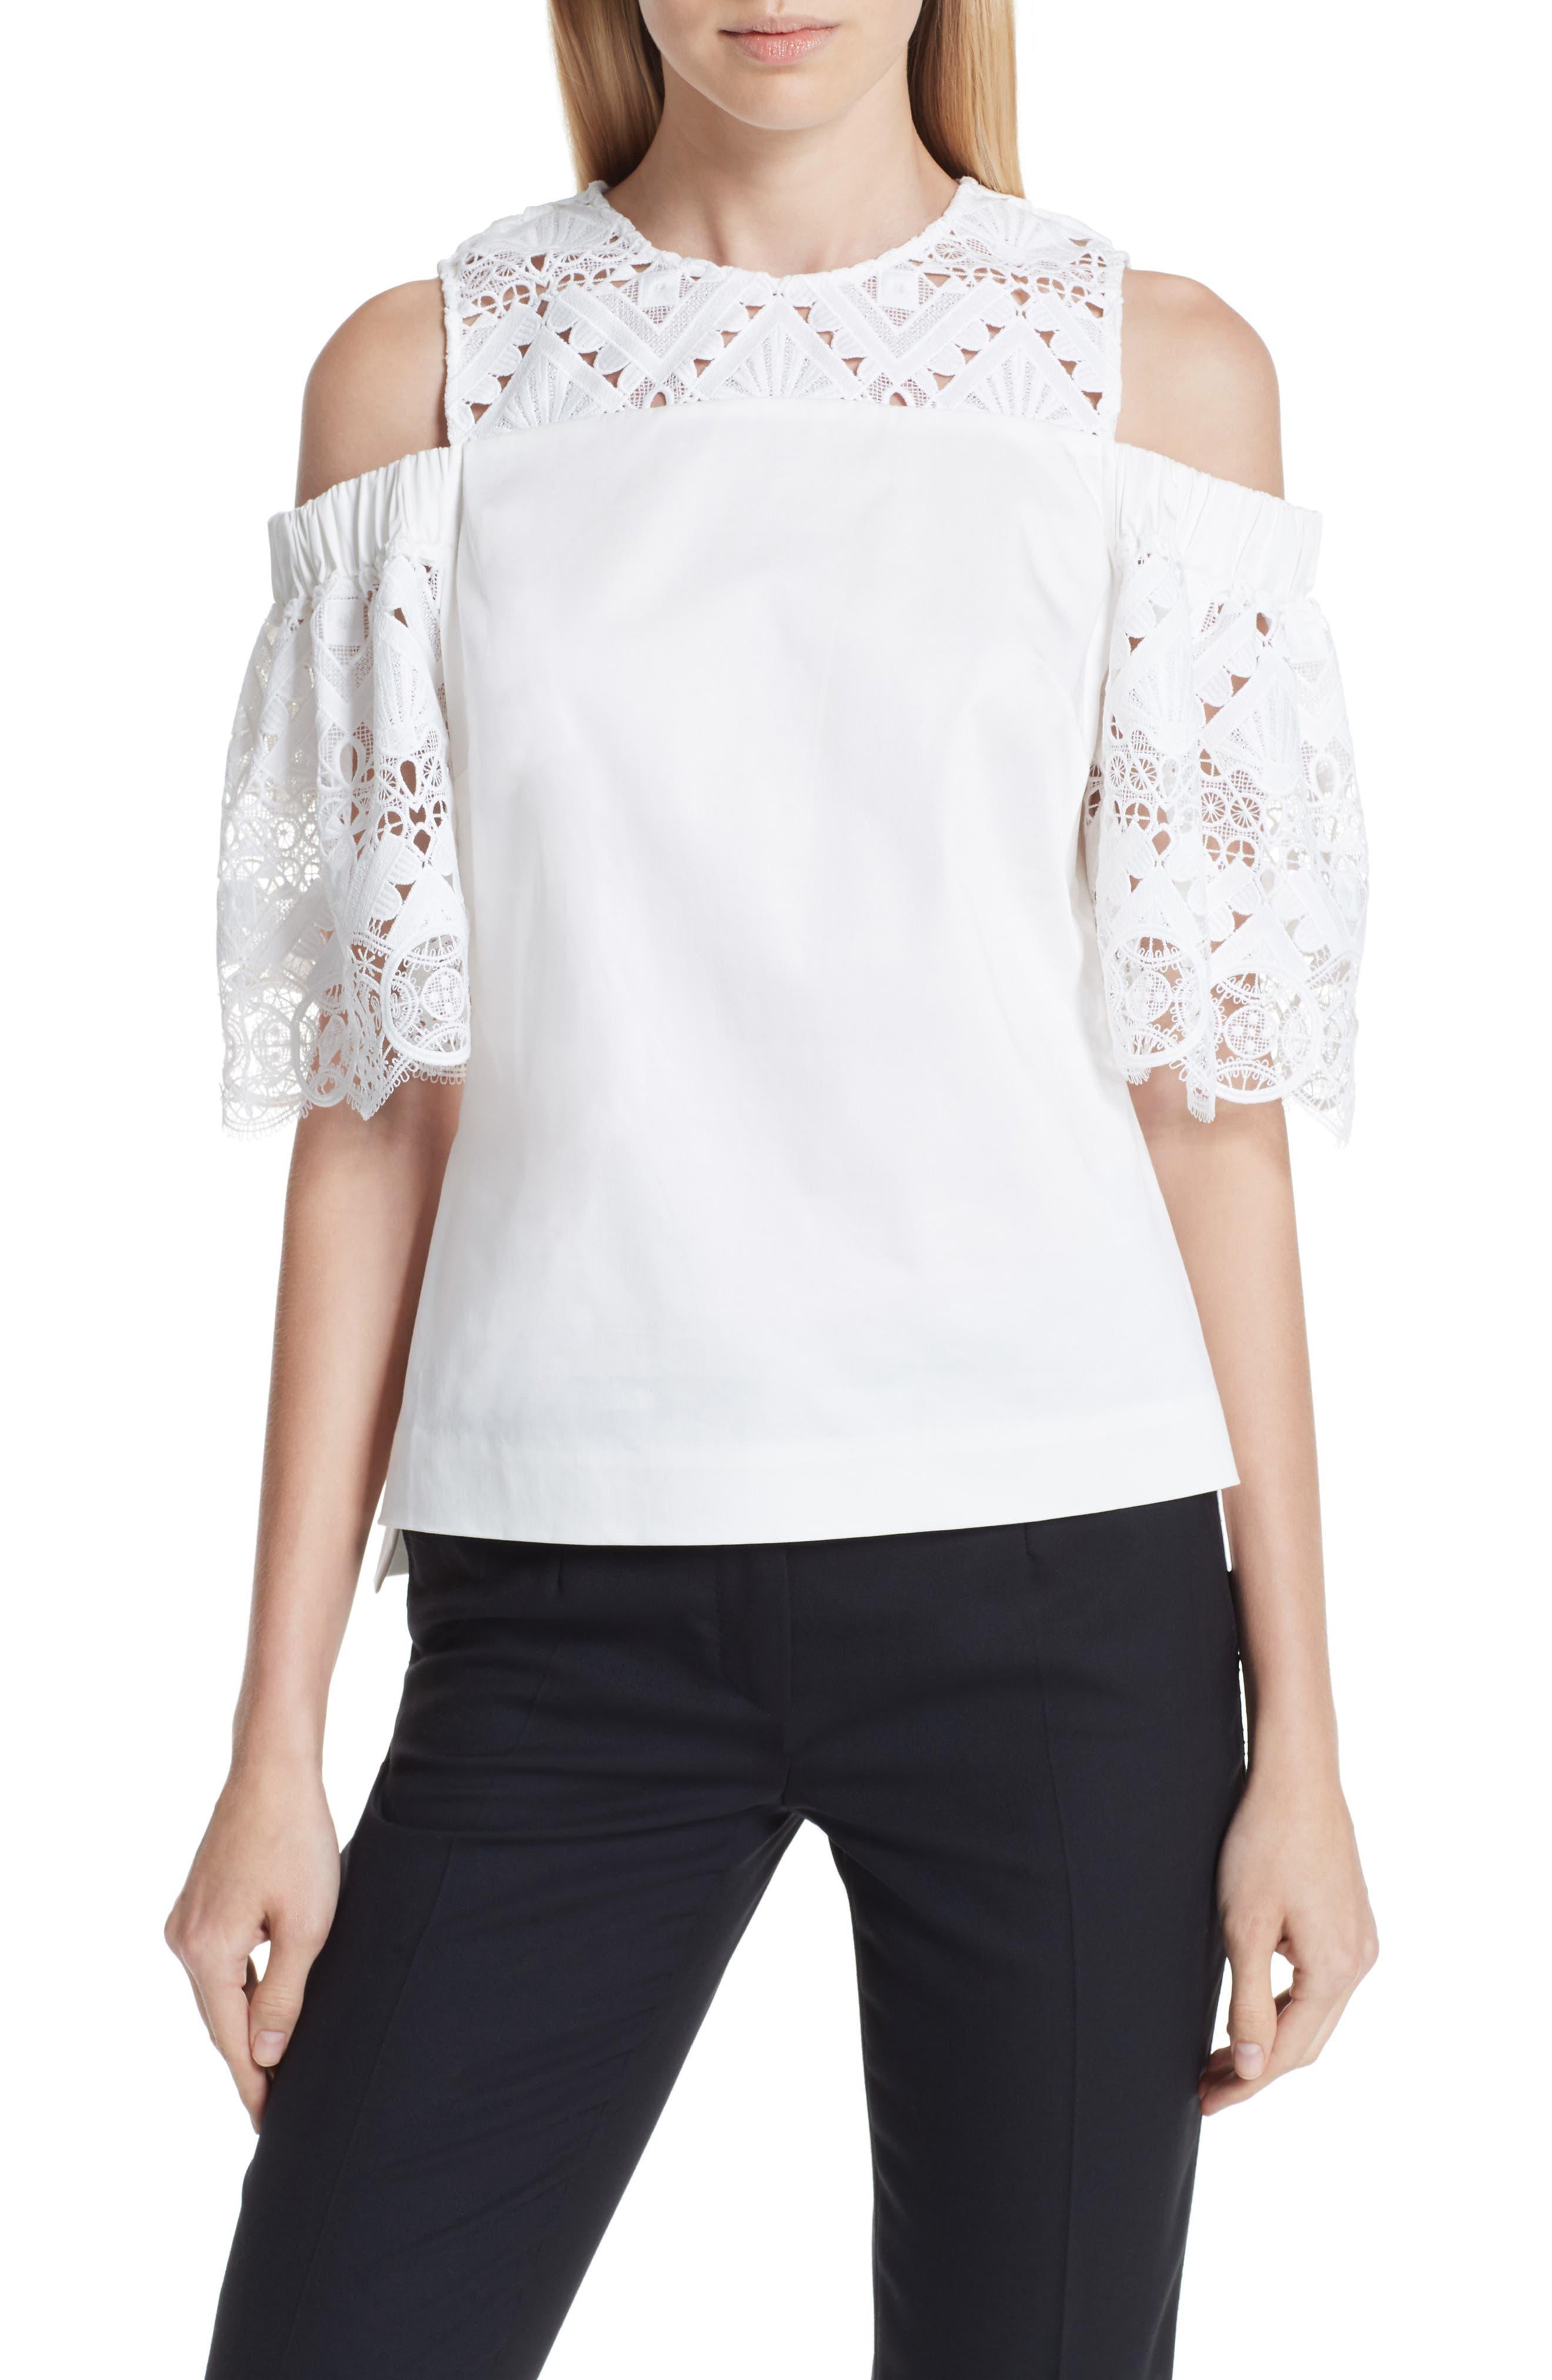 Taluah Mixed Lace Cold Shoulder Blouse,                         Main,                         color, White